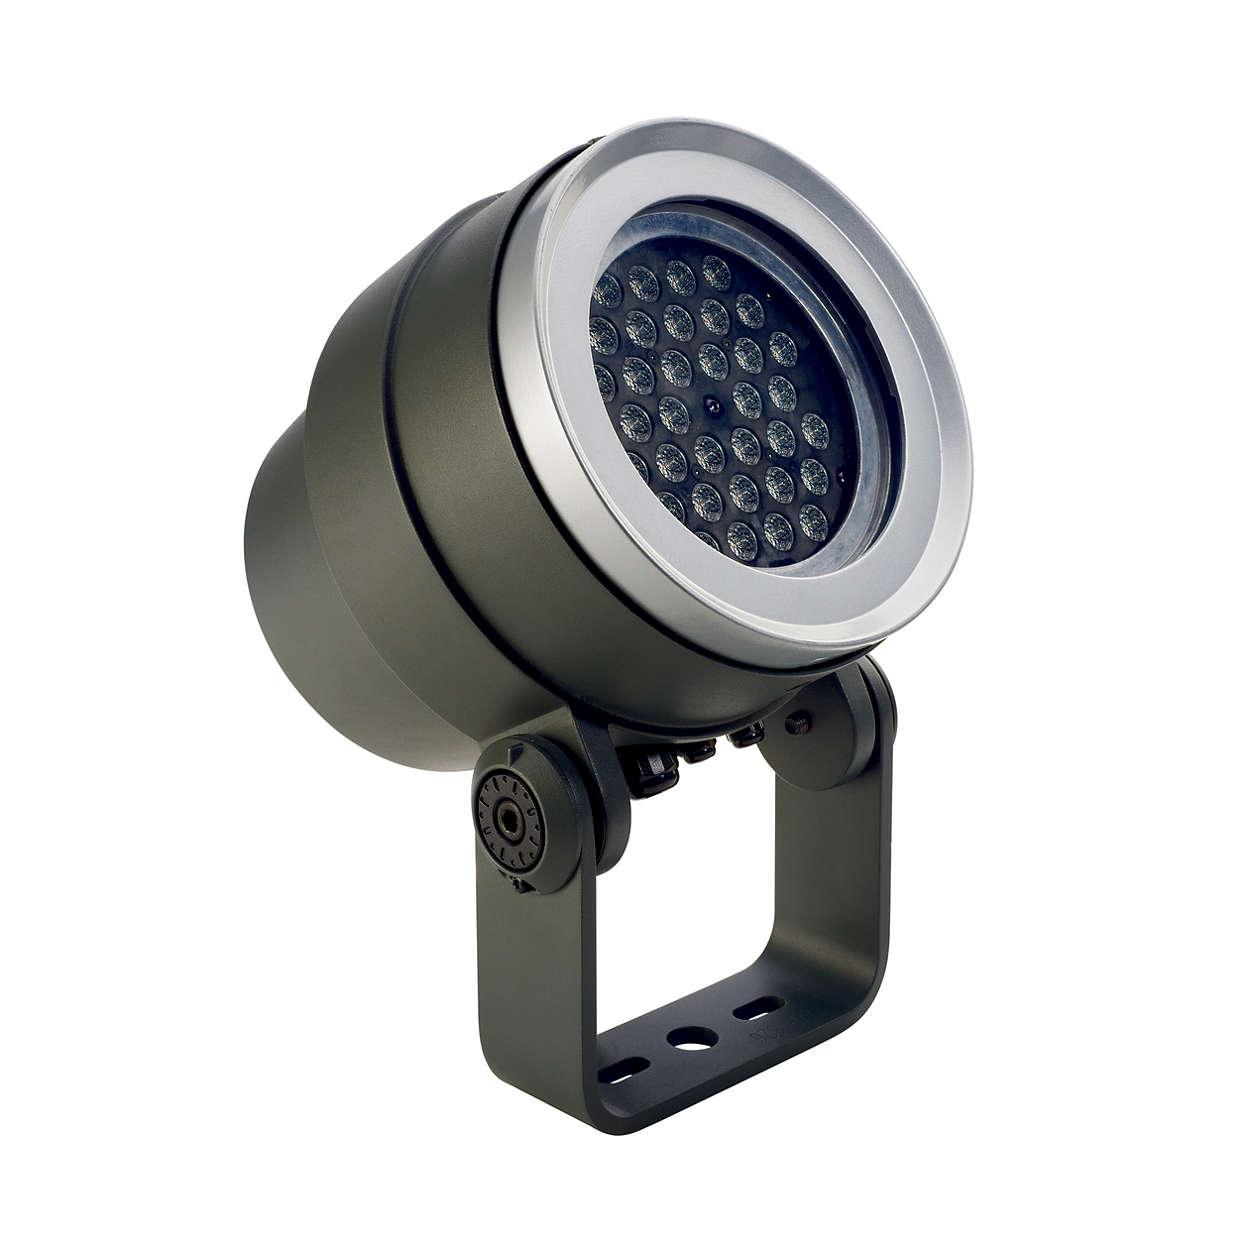 Decoflood² LED – verktygslåda för stadsbelysning